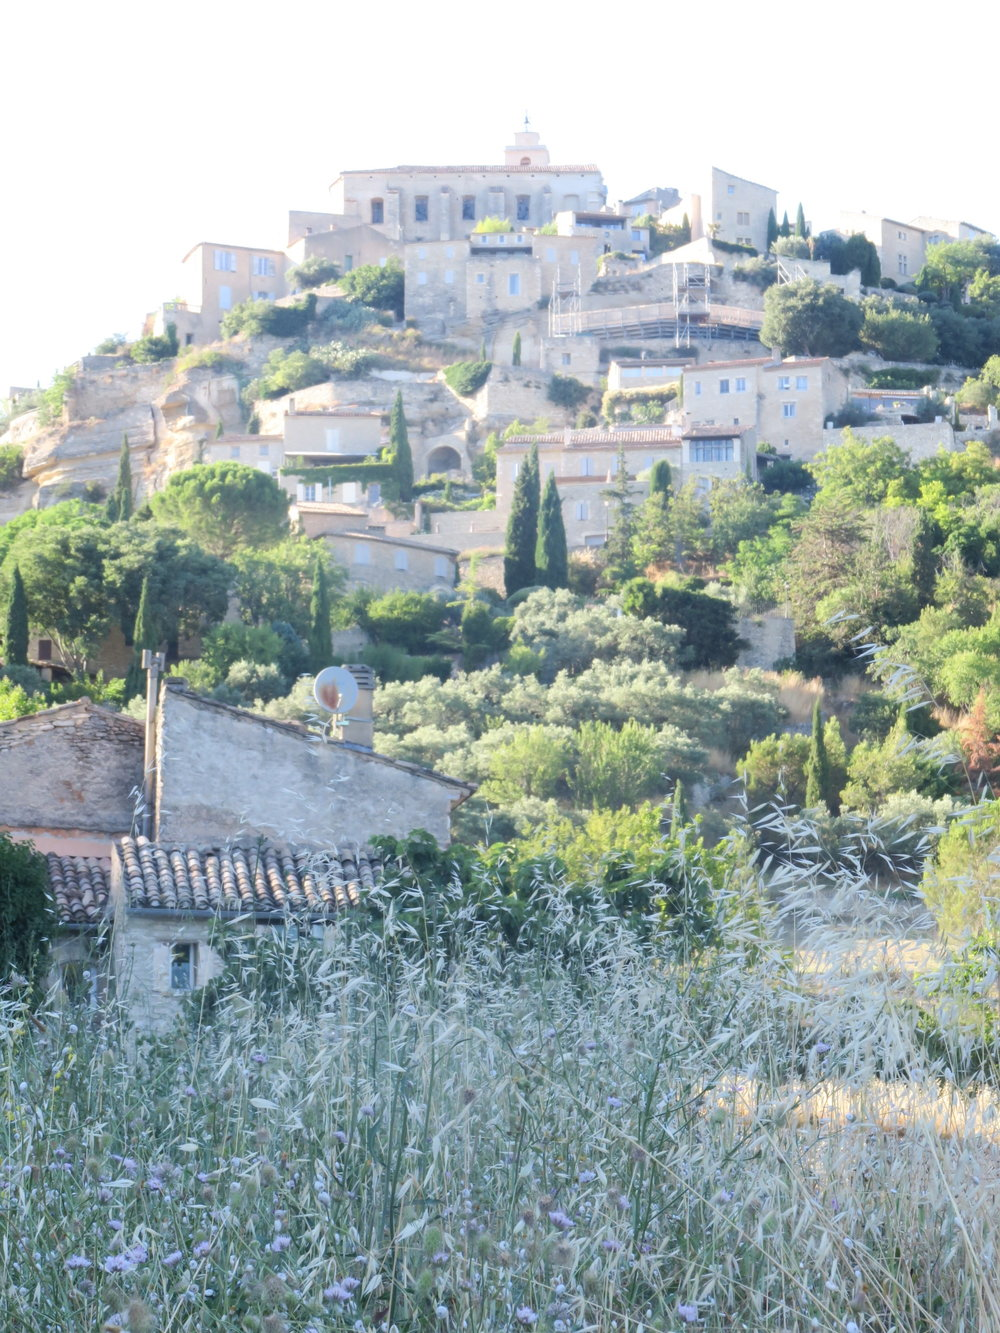 travellur_slow_travel_france_lavender_land_beauty_hill.jpg